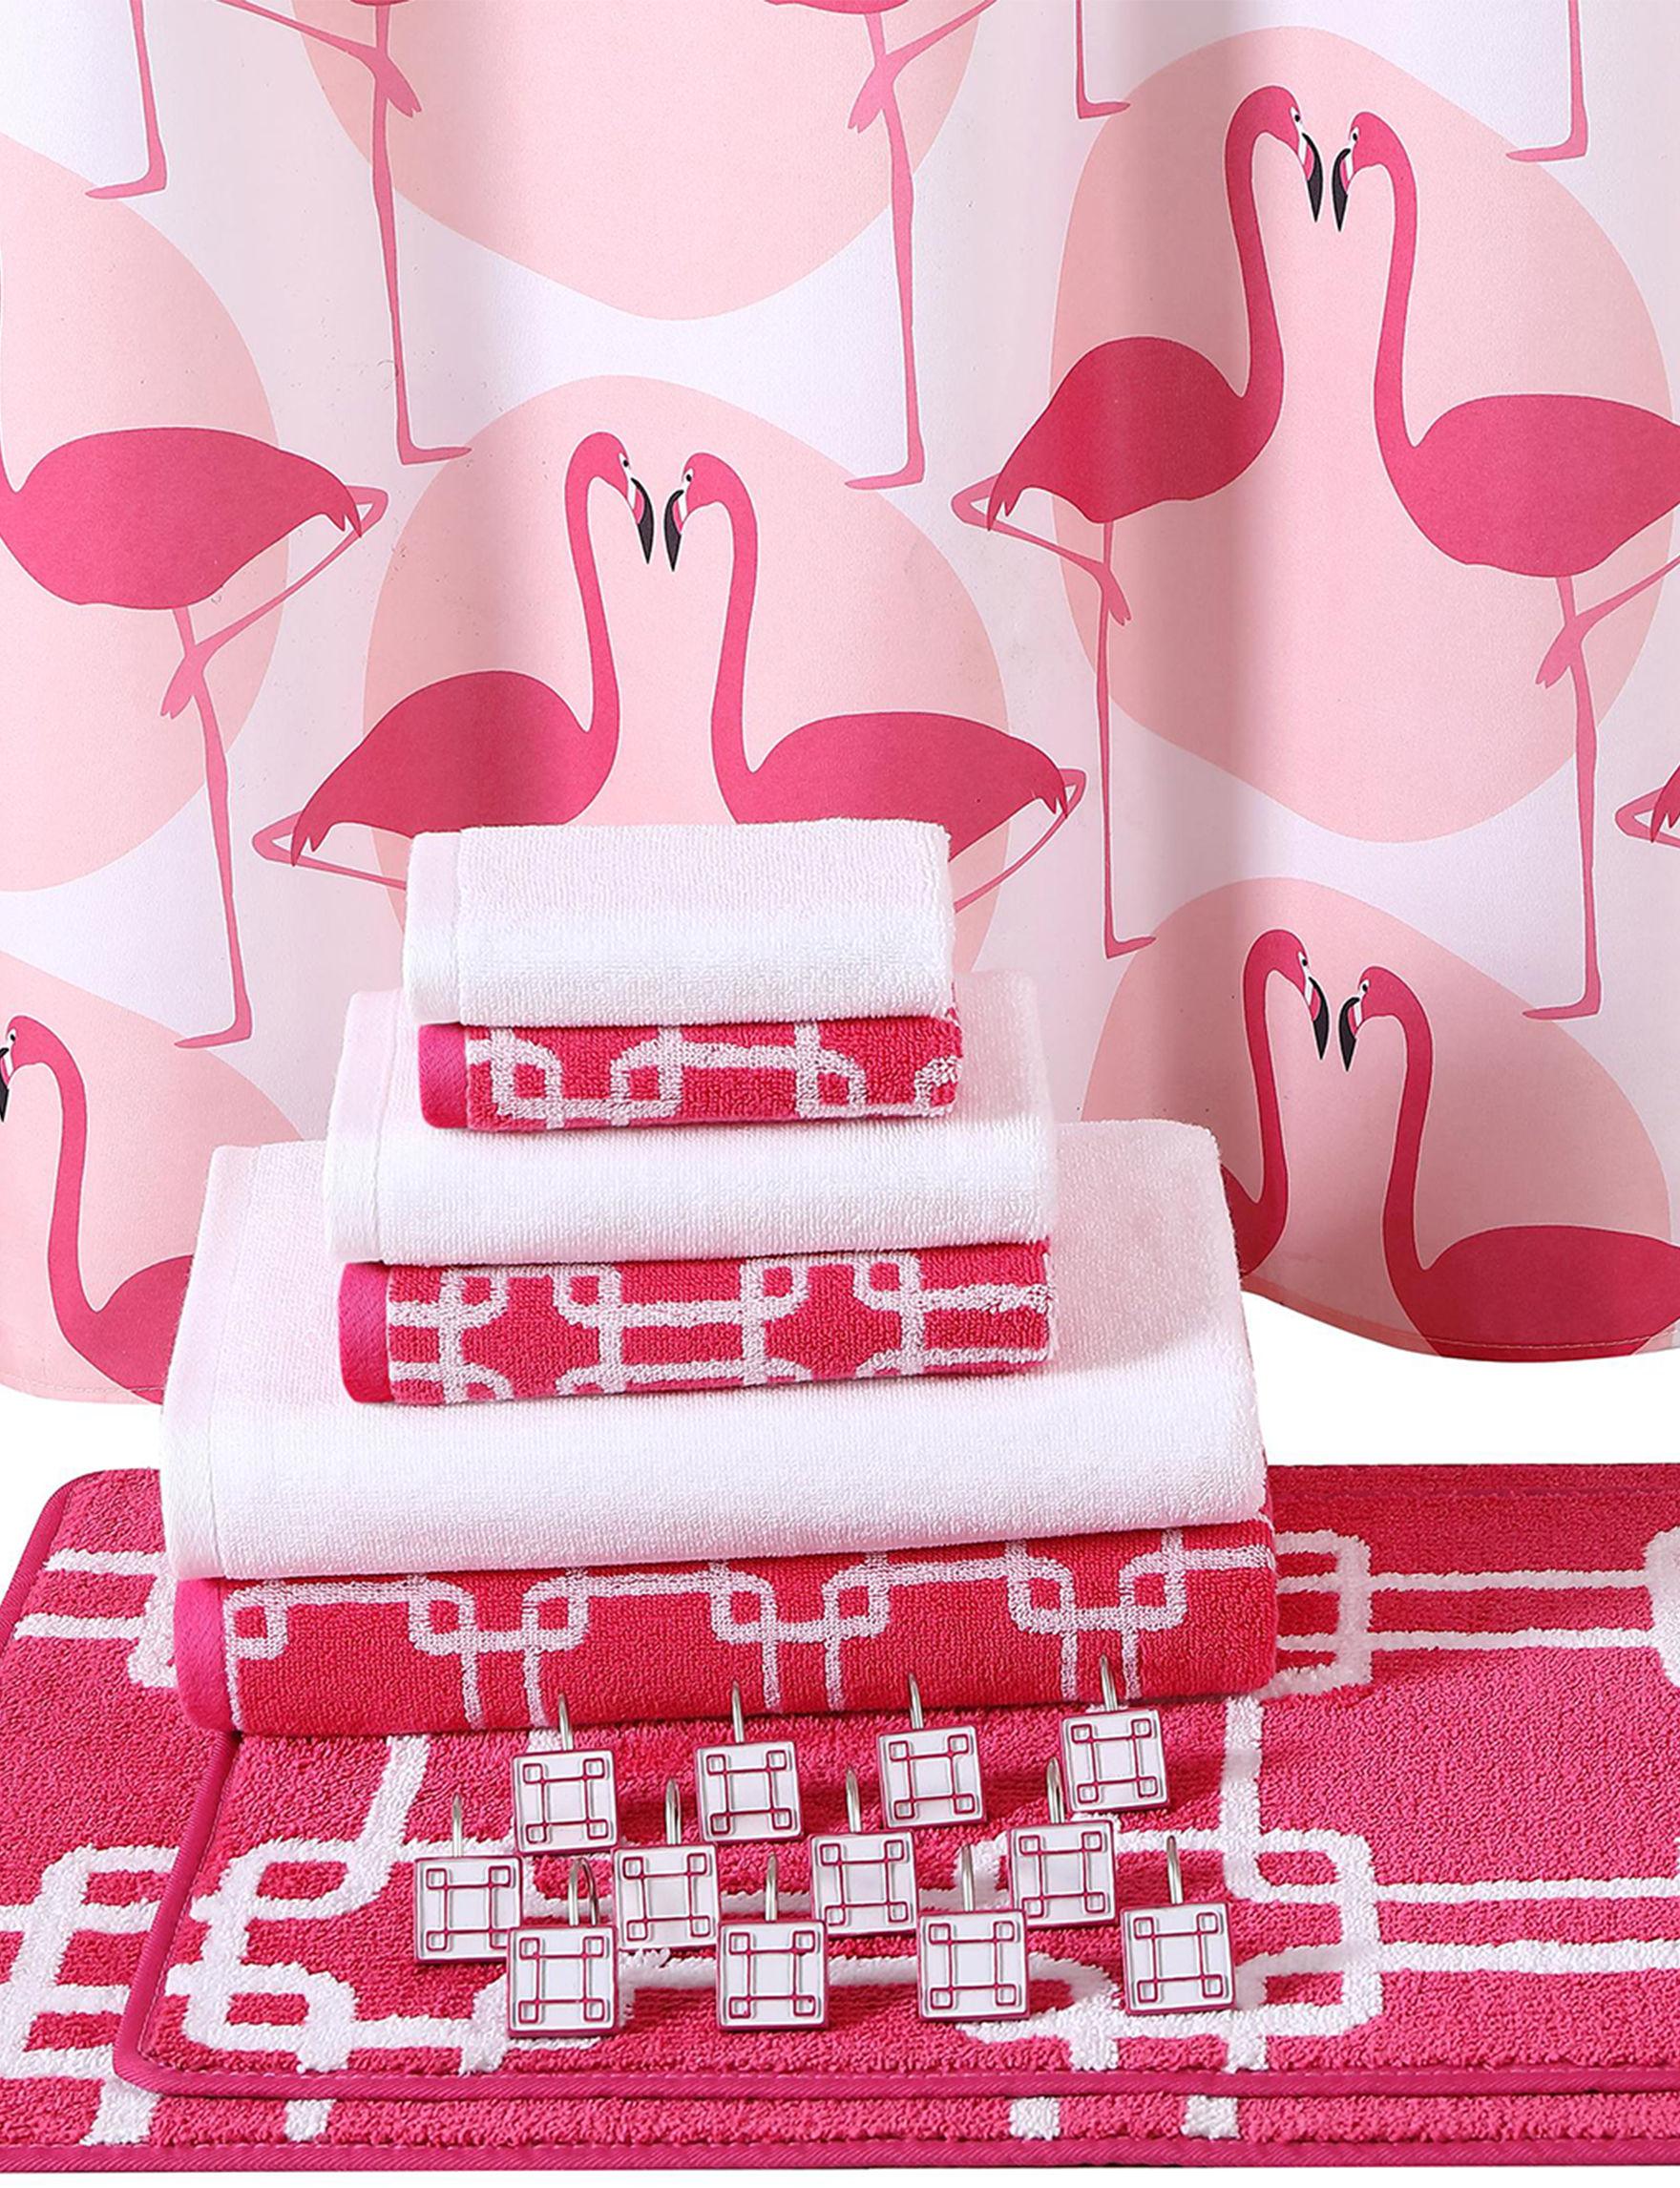 Clairebella  Bath Accessory Sets Bath Rugs & Mats Shower Curtains & Hooks